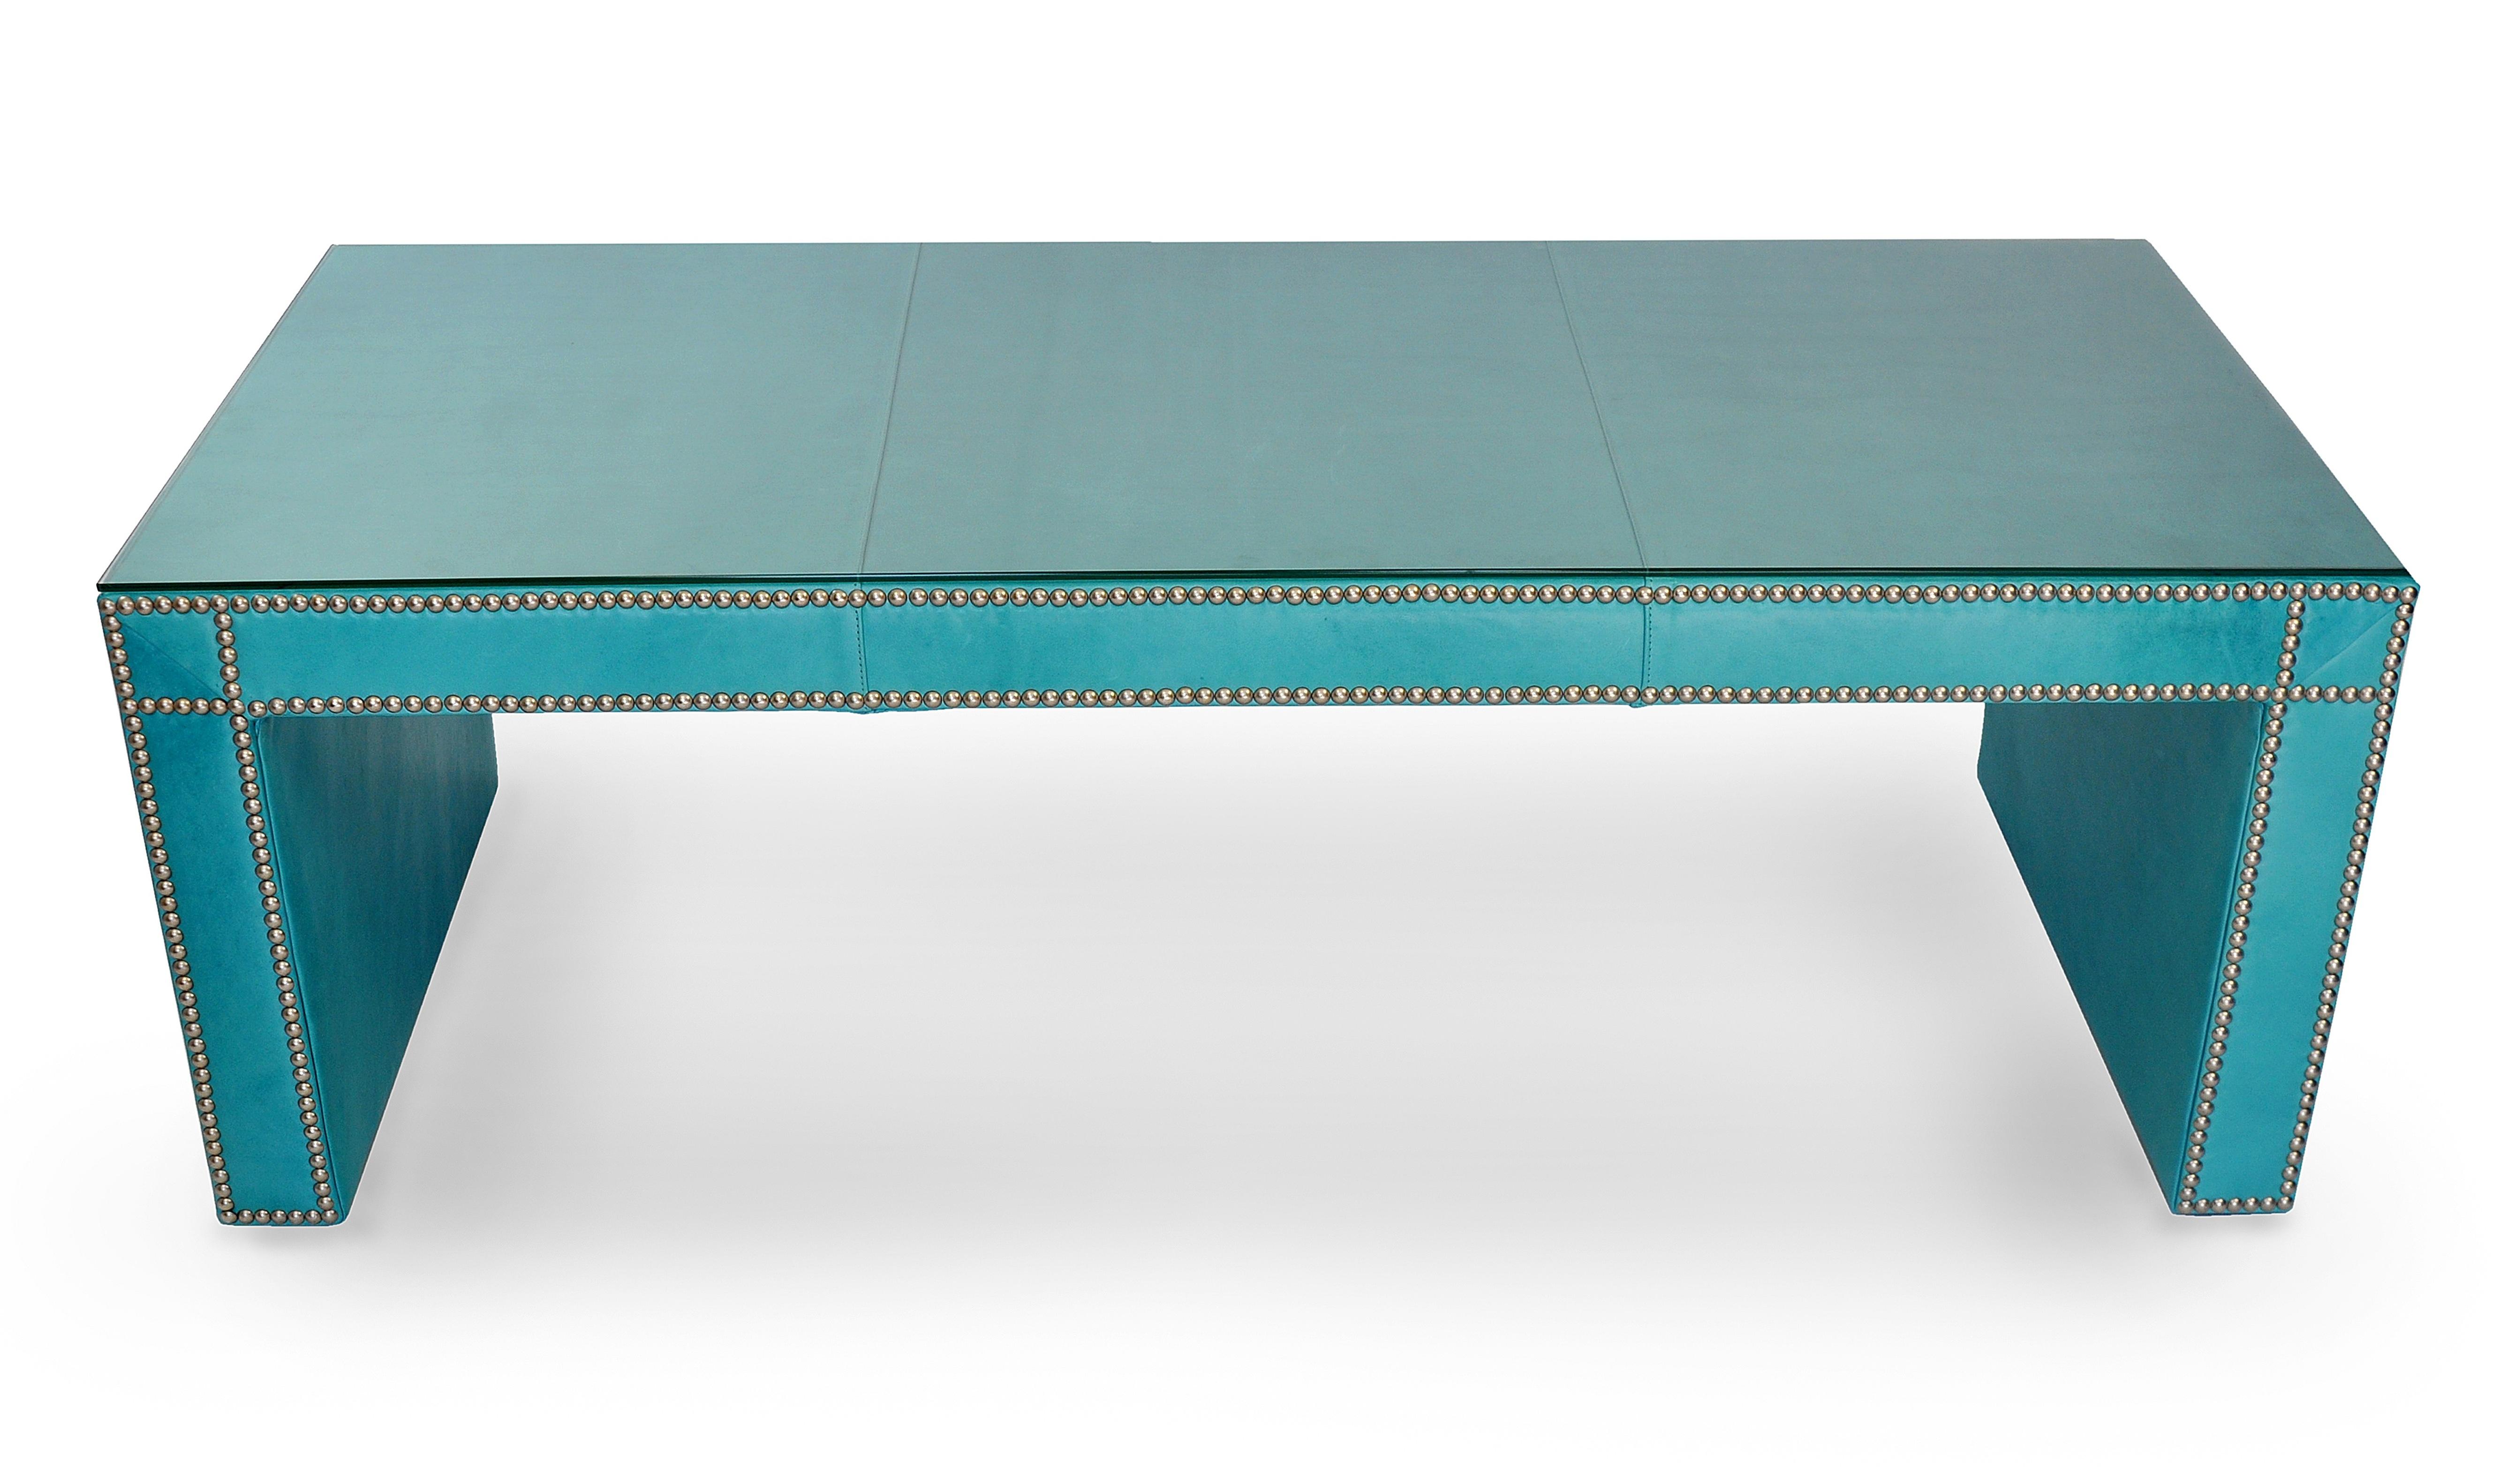 Aqua Leather Covered Coffee Table Mecox Gardens - Leather covered coffee table